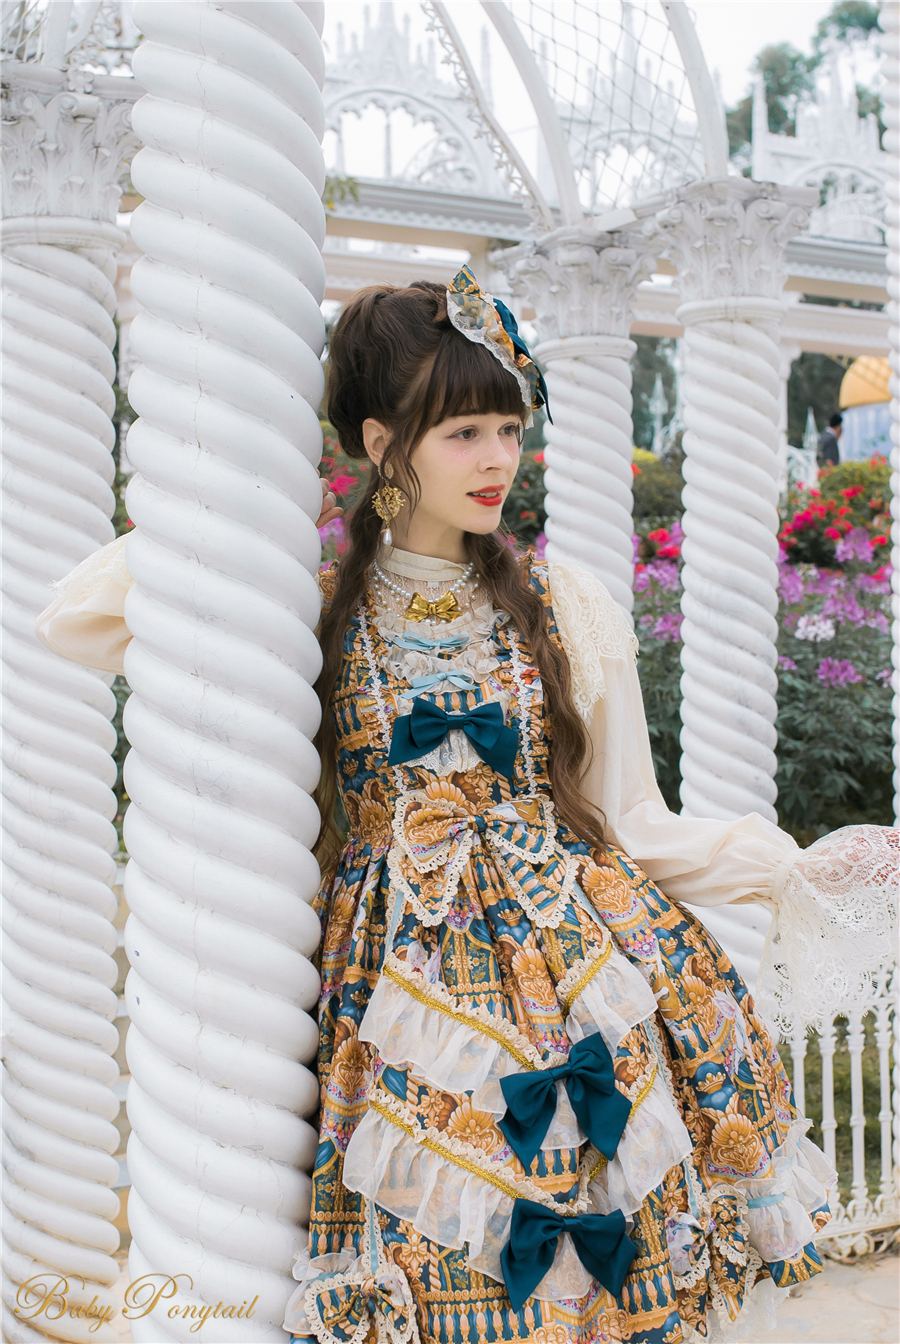 Babyponytail_Model_JSK_Tiel Present Angel_Claudia_2_02.jpg